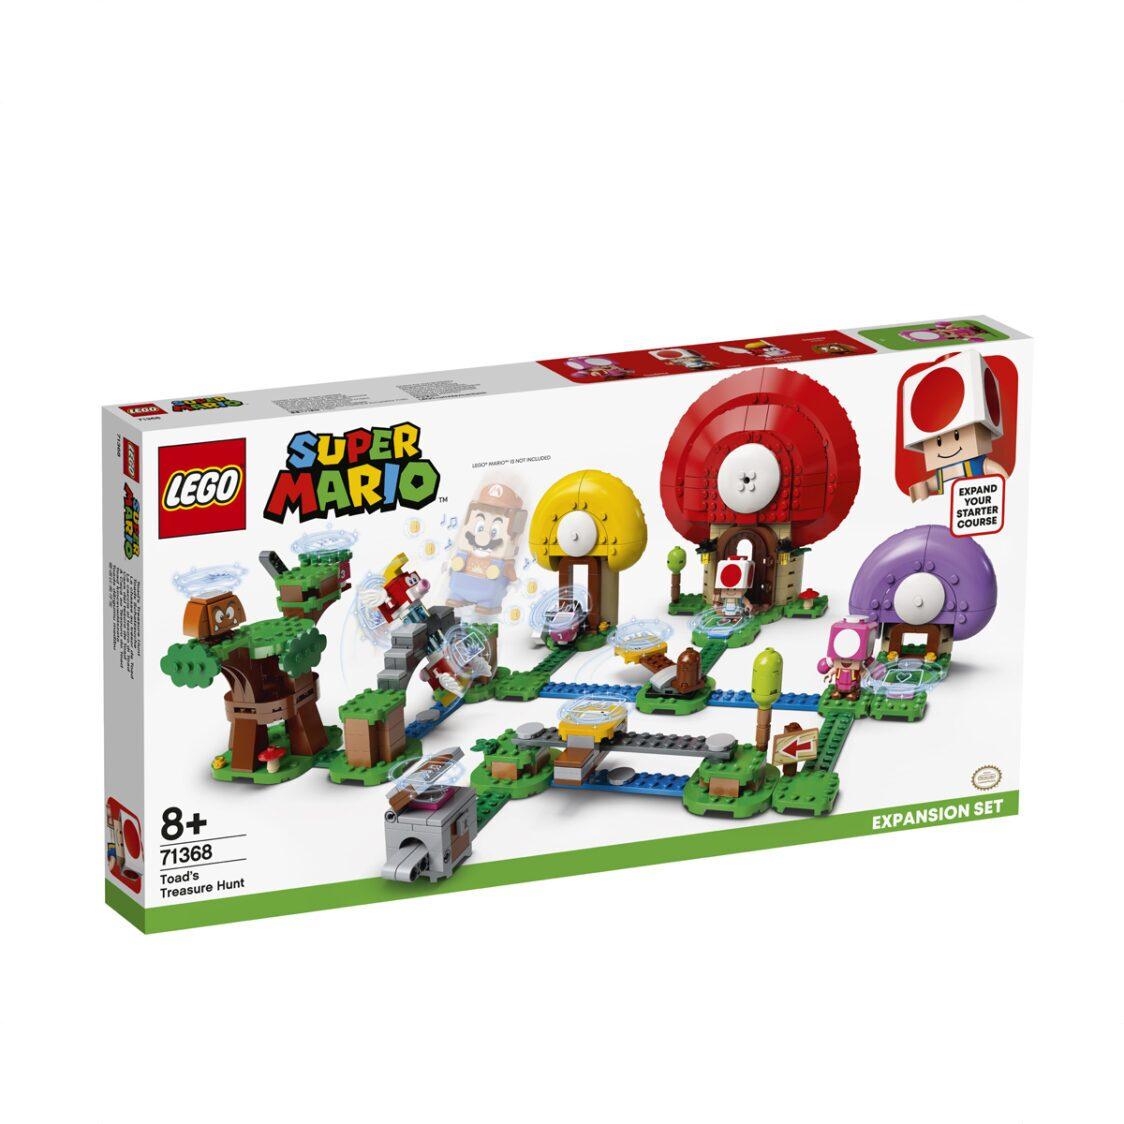 LEGO Super Mario - Toads Treasure Hunt Expansion Set 71368 V29